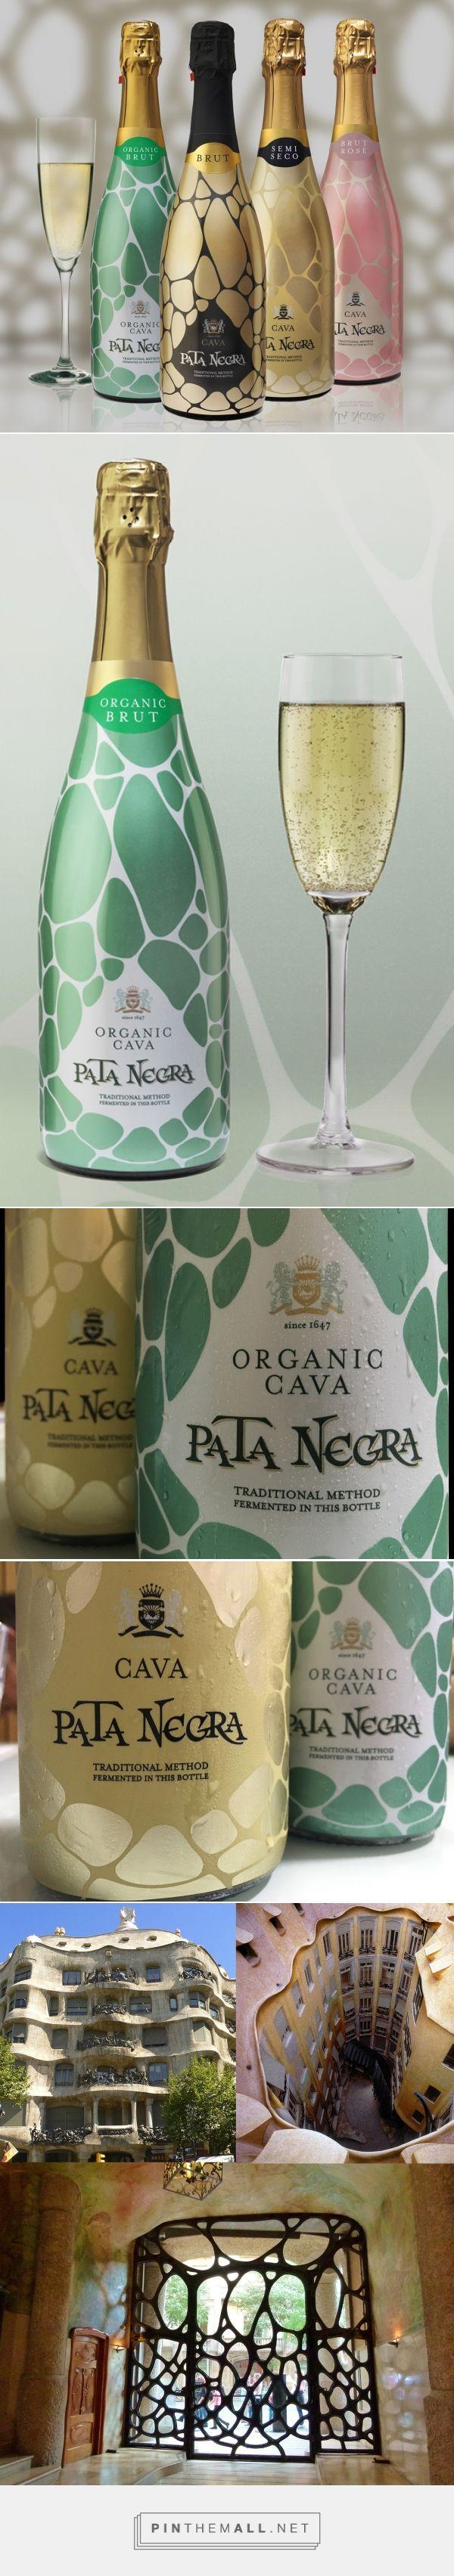 Cava Pata Negra Wine - Packaging of the World - Creative Package Design Gallery - http://www.packagingoftheworld.com/2016/10/cava-pata-negra.html